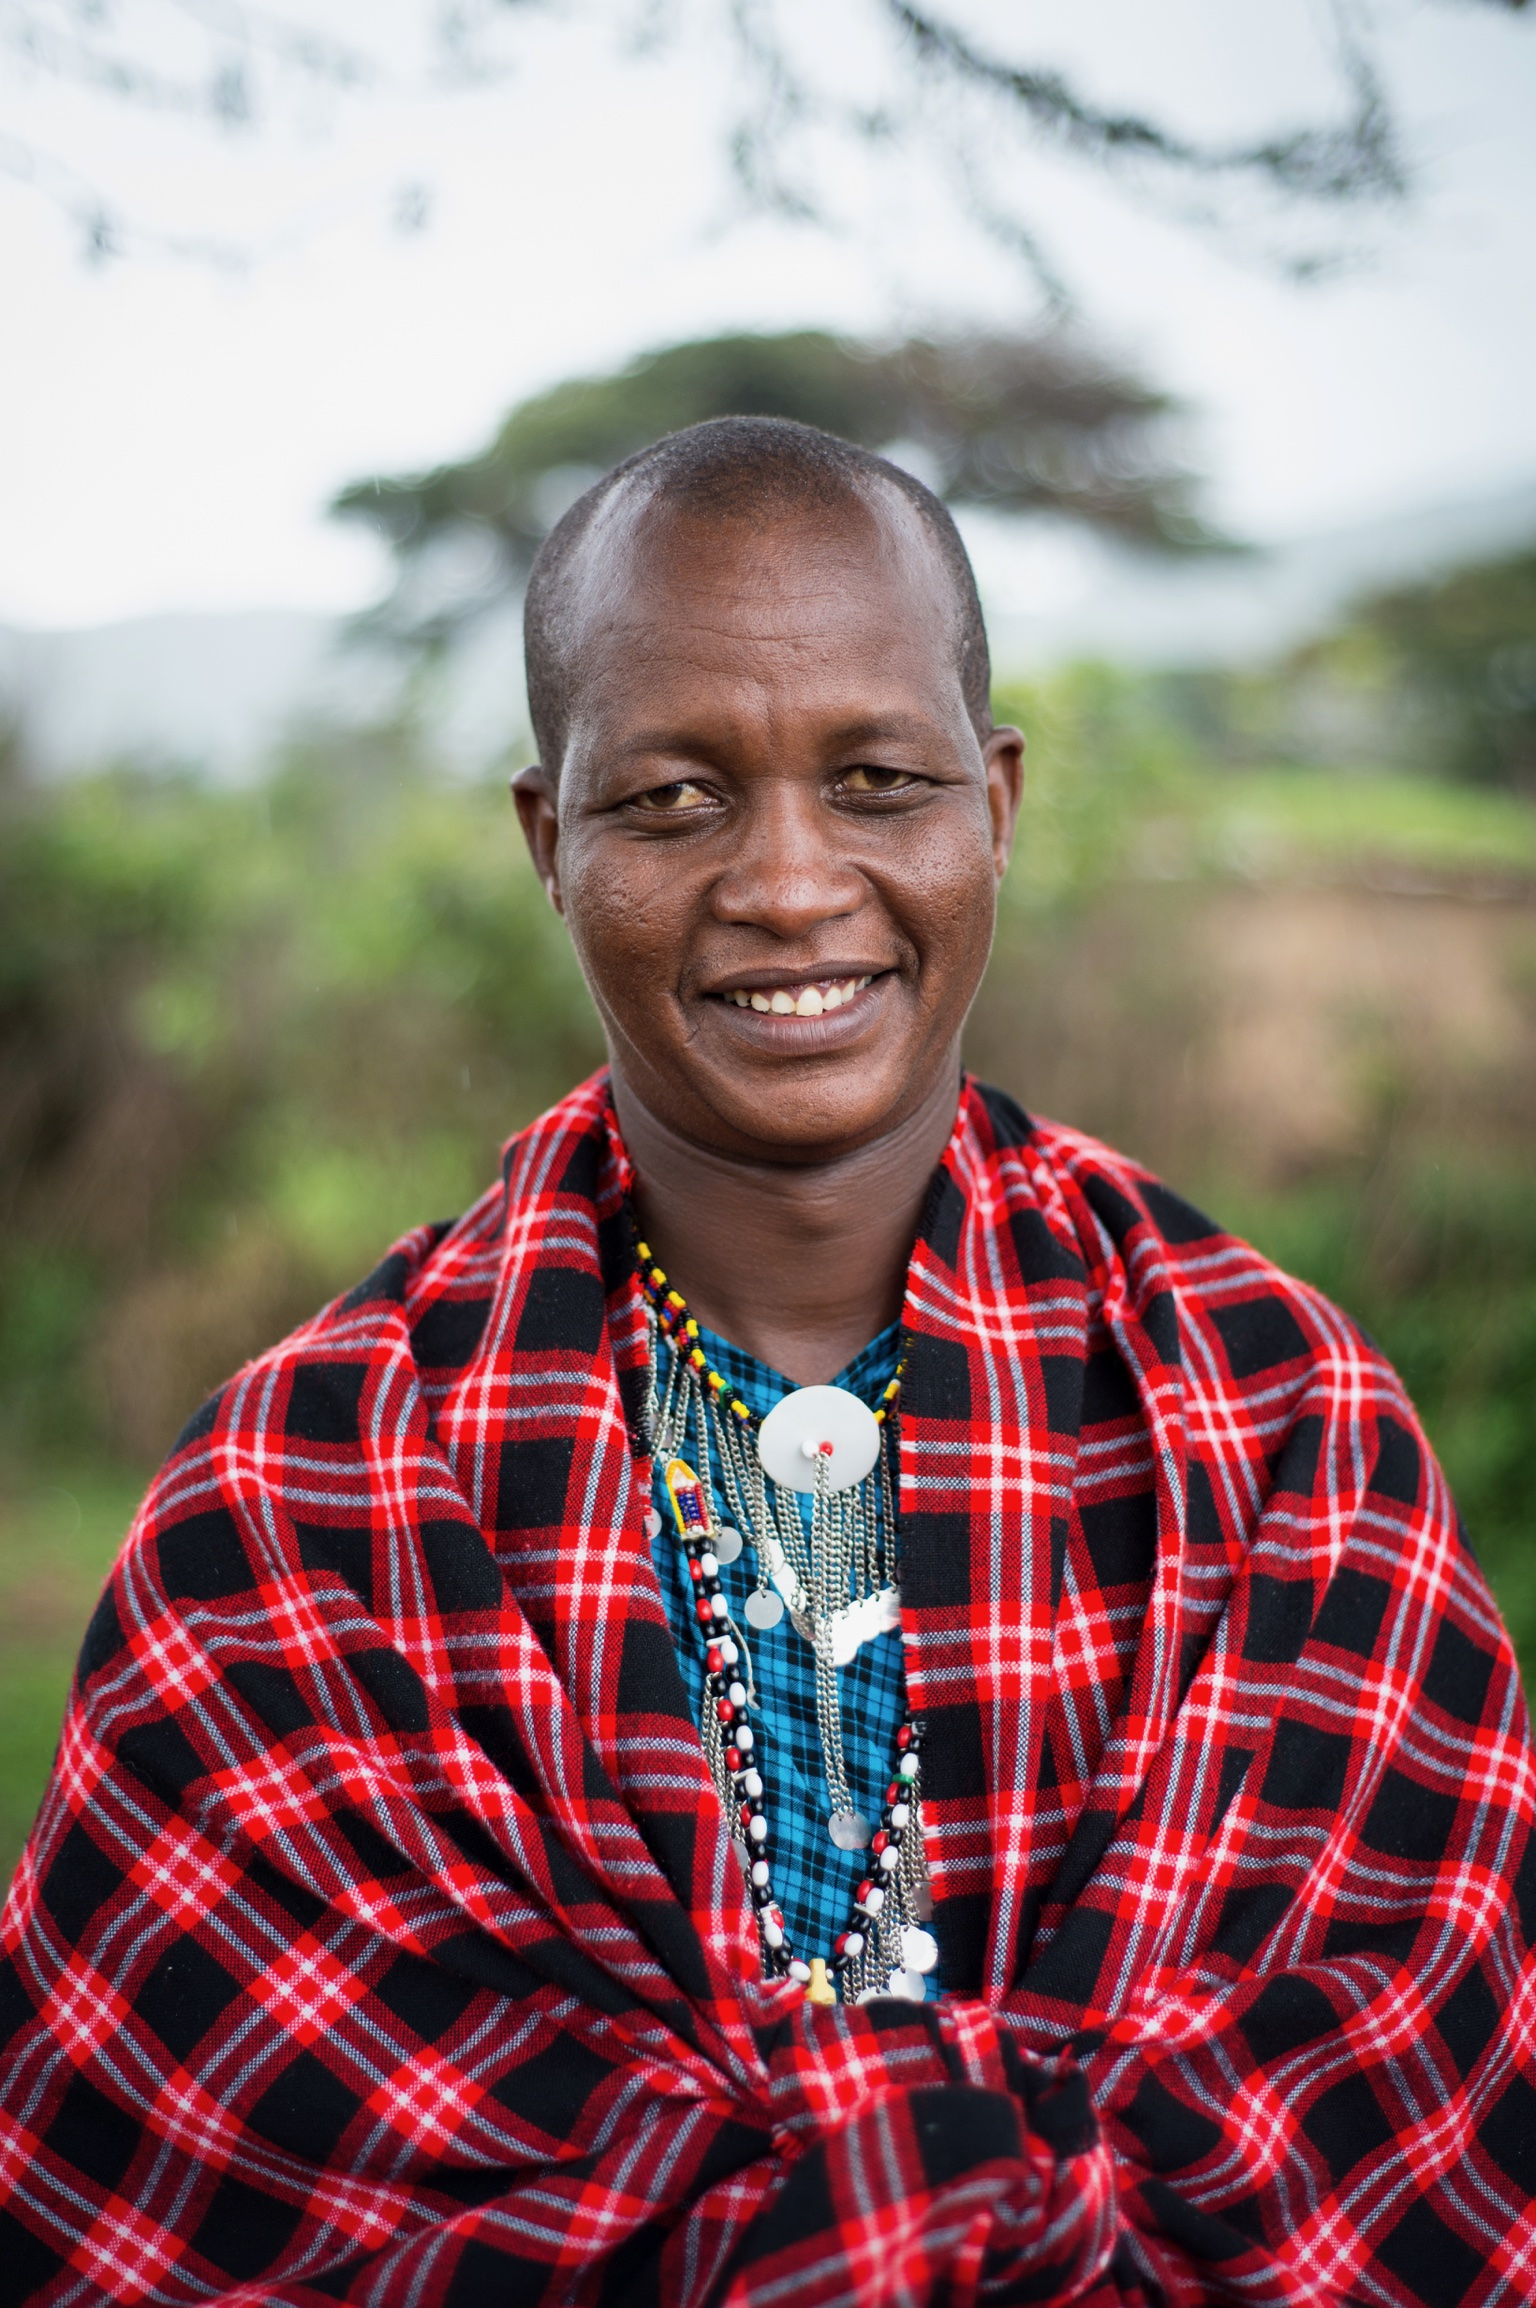 Kenya 2018 - Safari Day 4-196.jpg